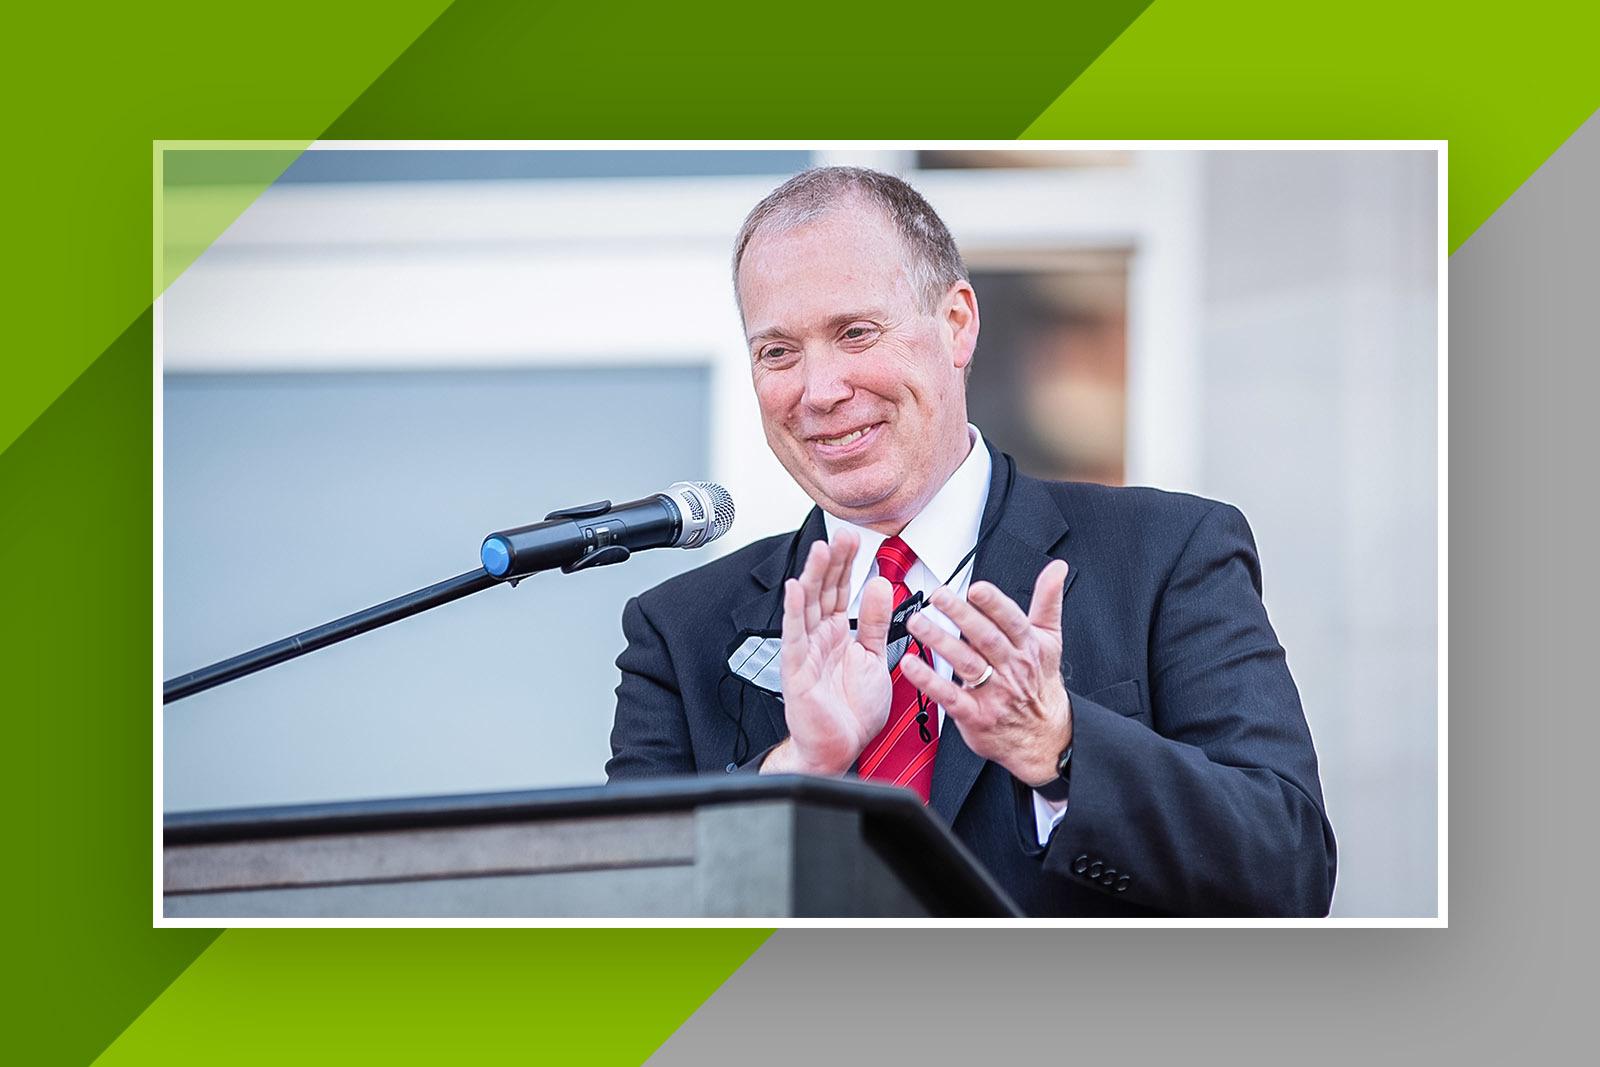 JSU President Dr. Don Killingsworth provides remarks at the dedication ceremony for Angle Hall.